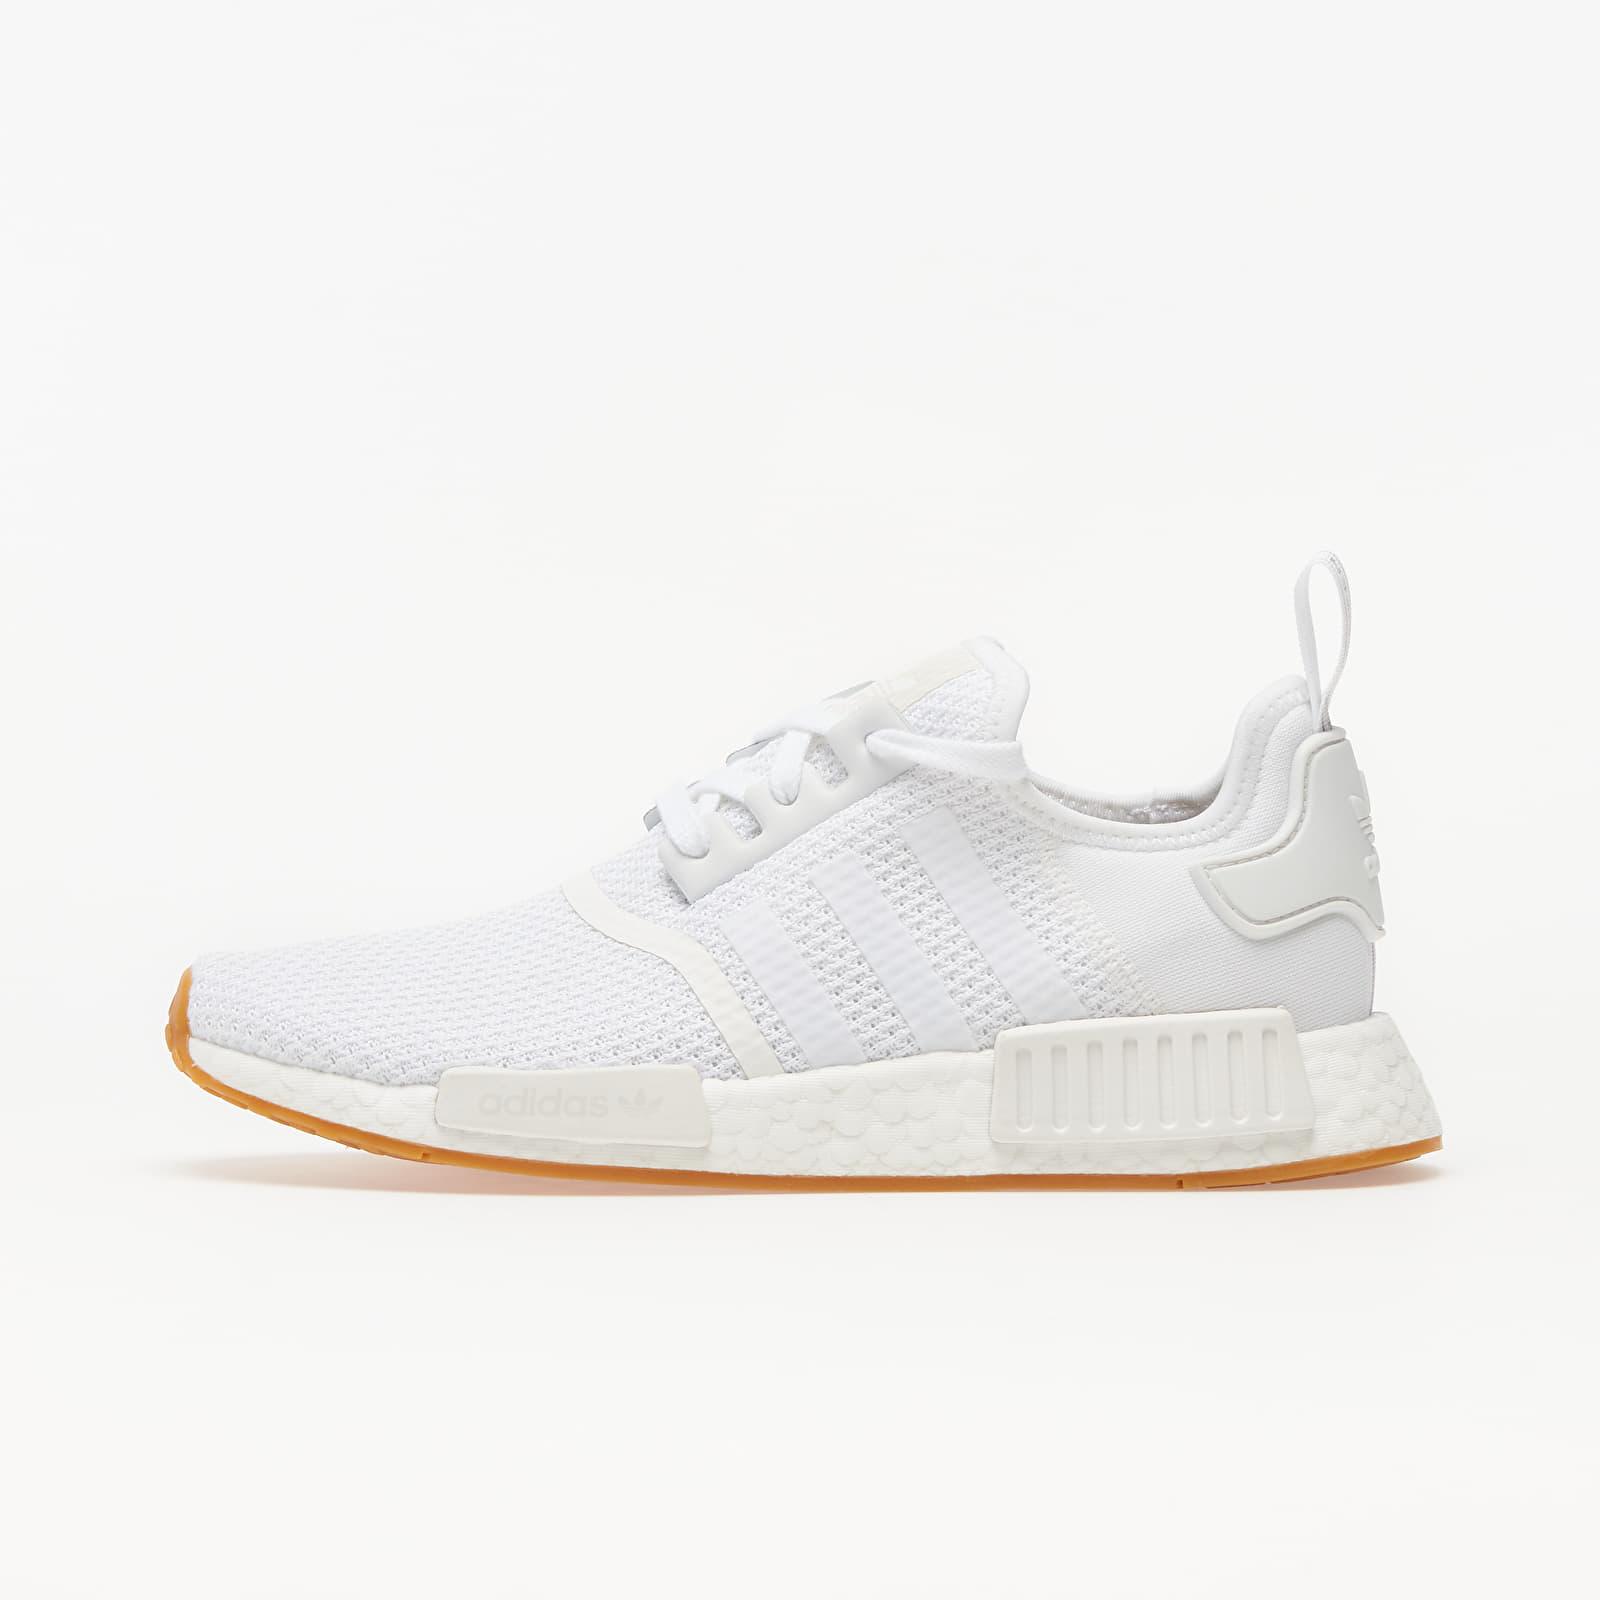 adidas NMD_R1 Ftw White/ Ftw White/ Gum 3 EUR 39 1/3